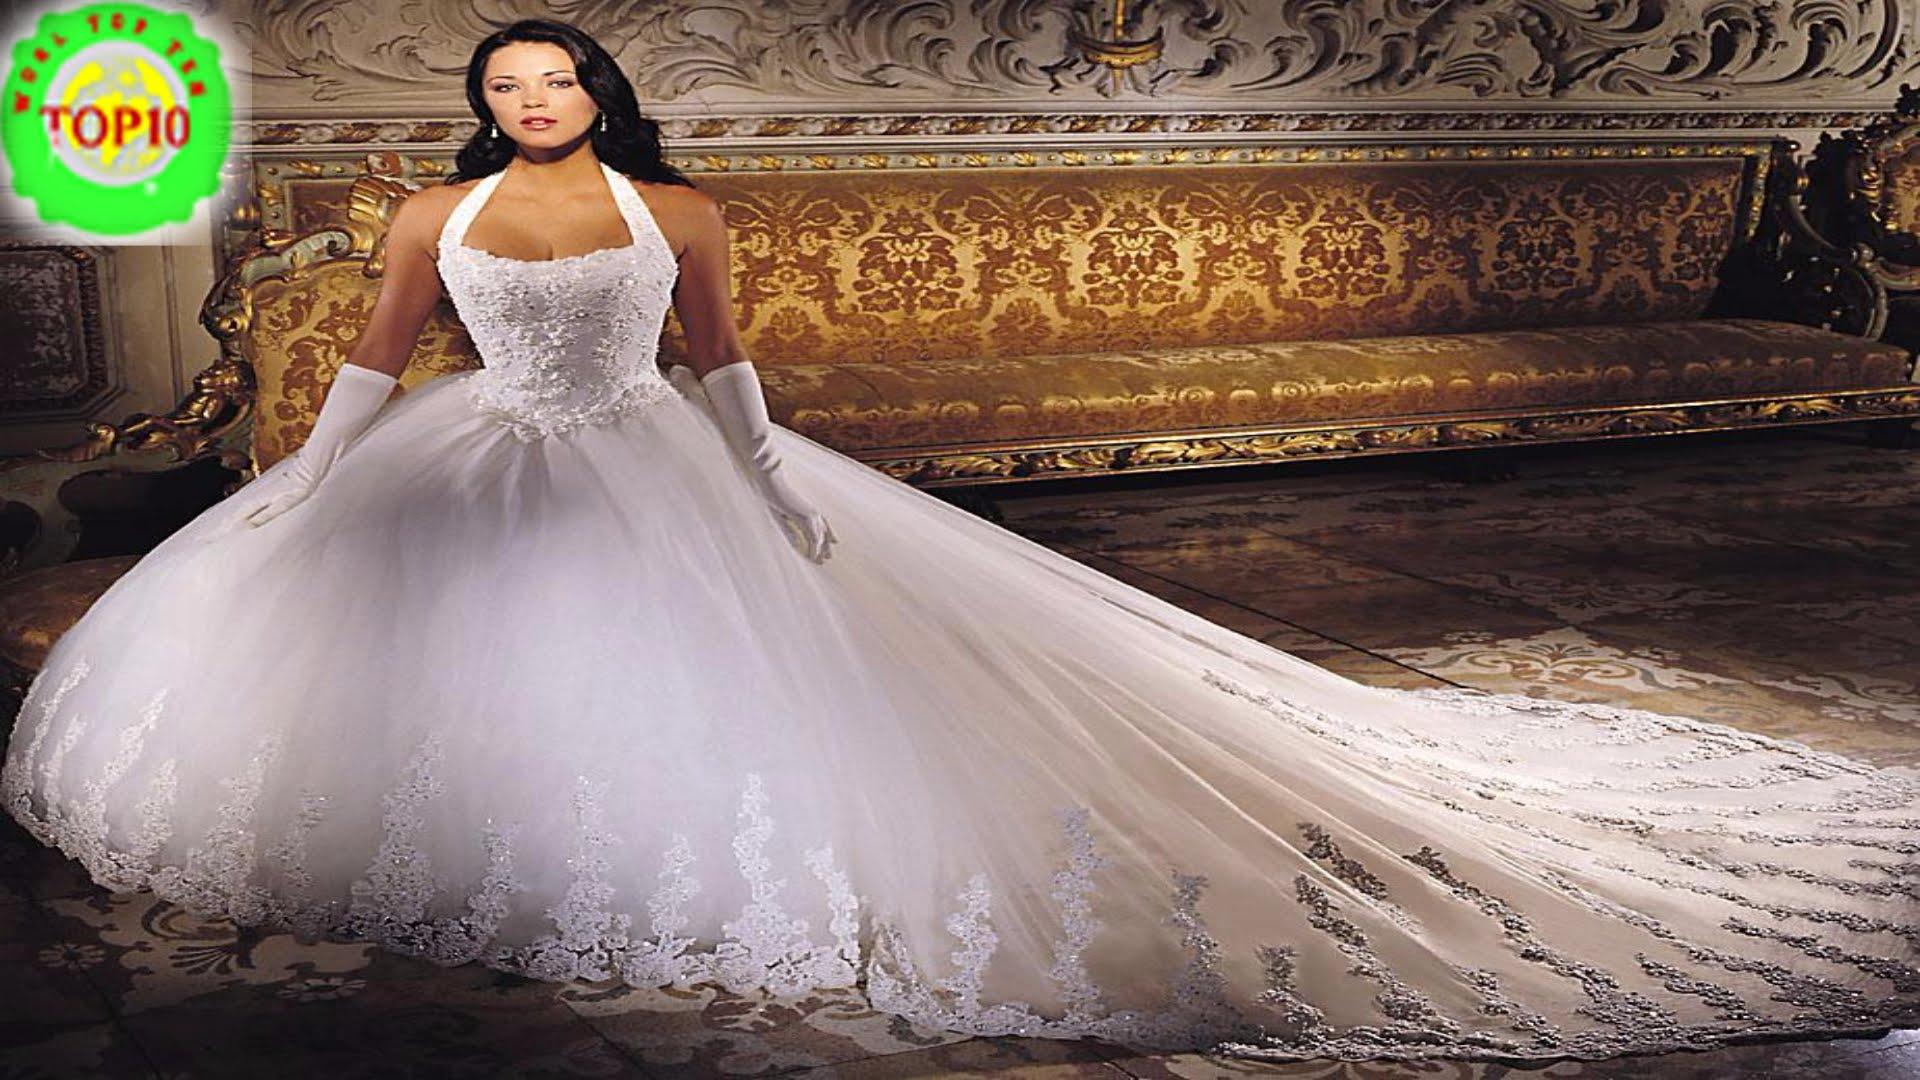 biggest wedding dresses ever photo - 1